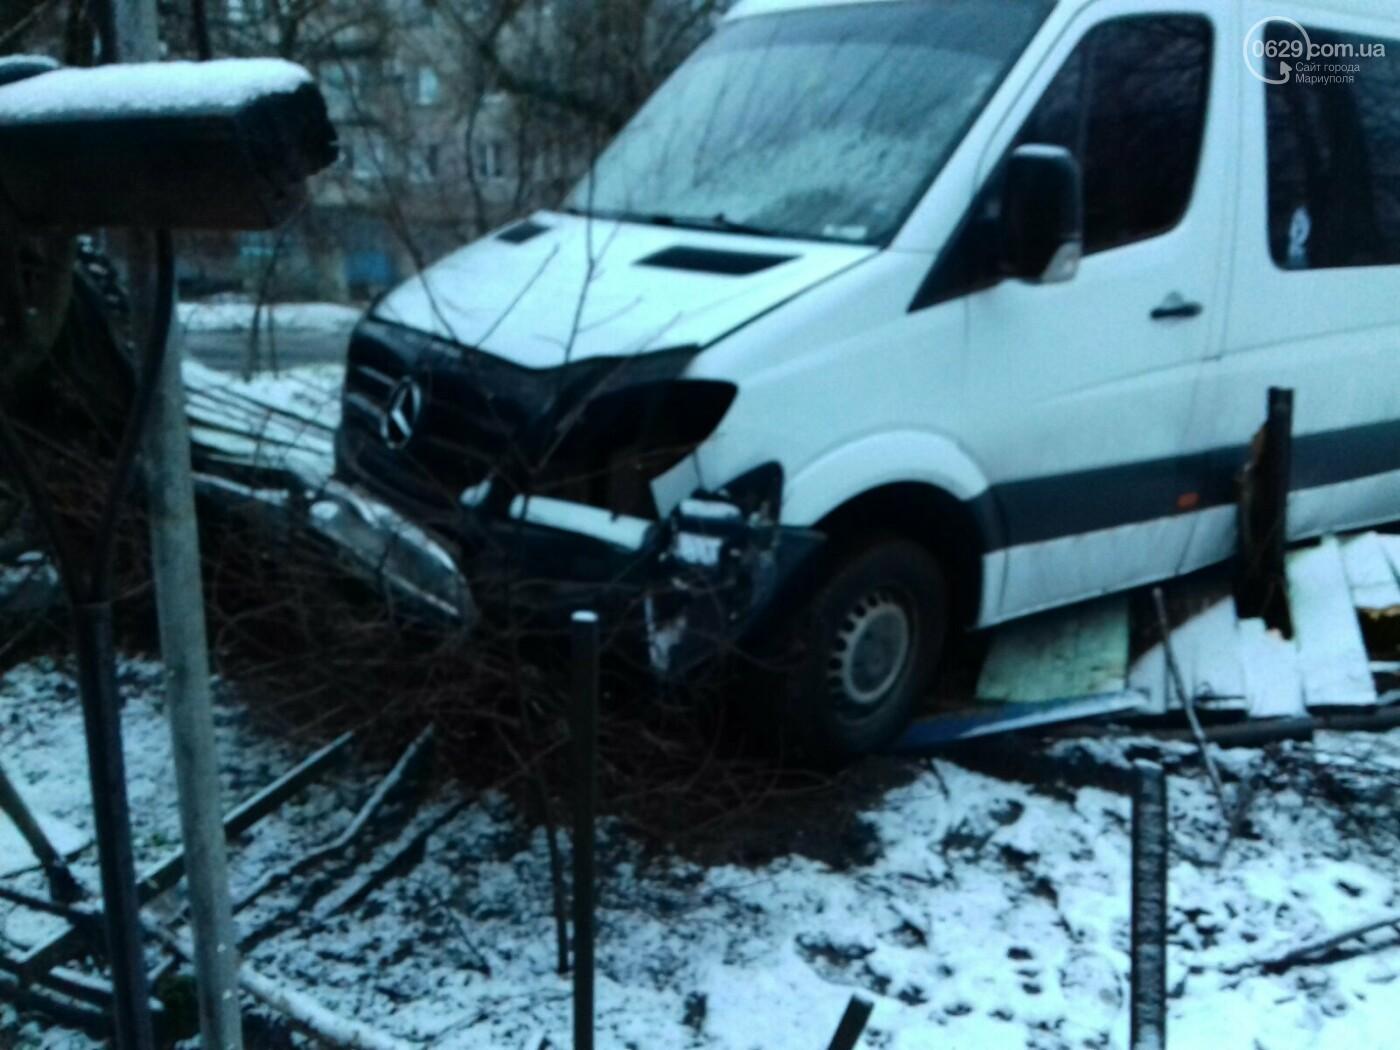 На Левобережье Мариуполя микроавтобус врезался в забор жилого дома, - ФОТО, фото-2